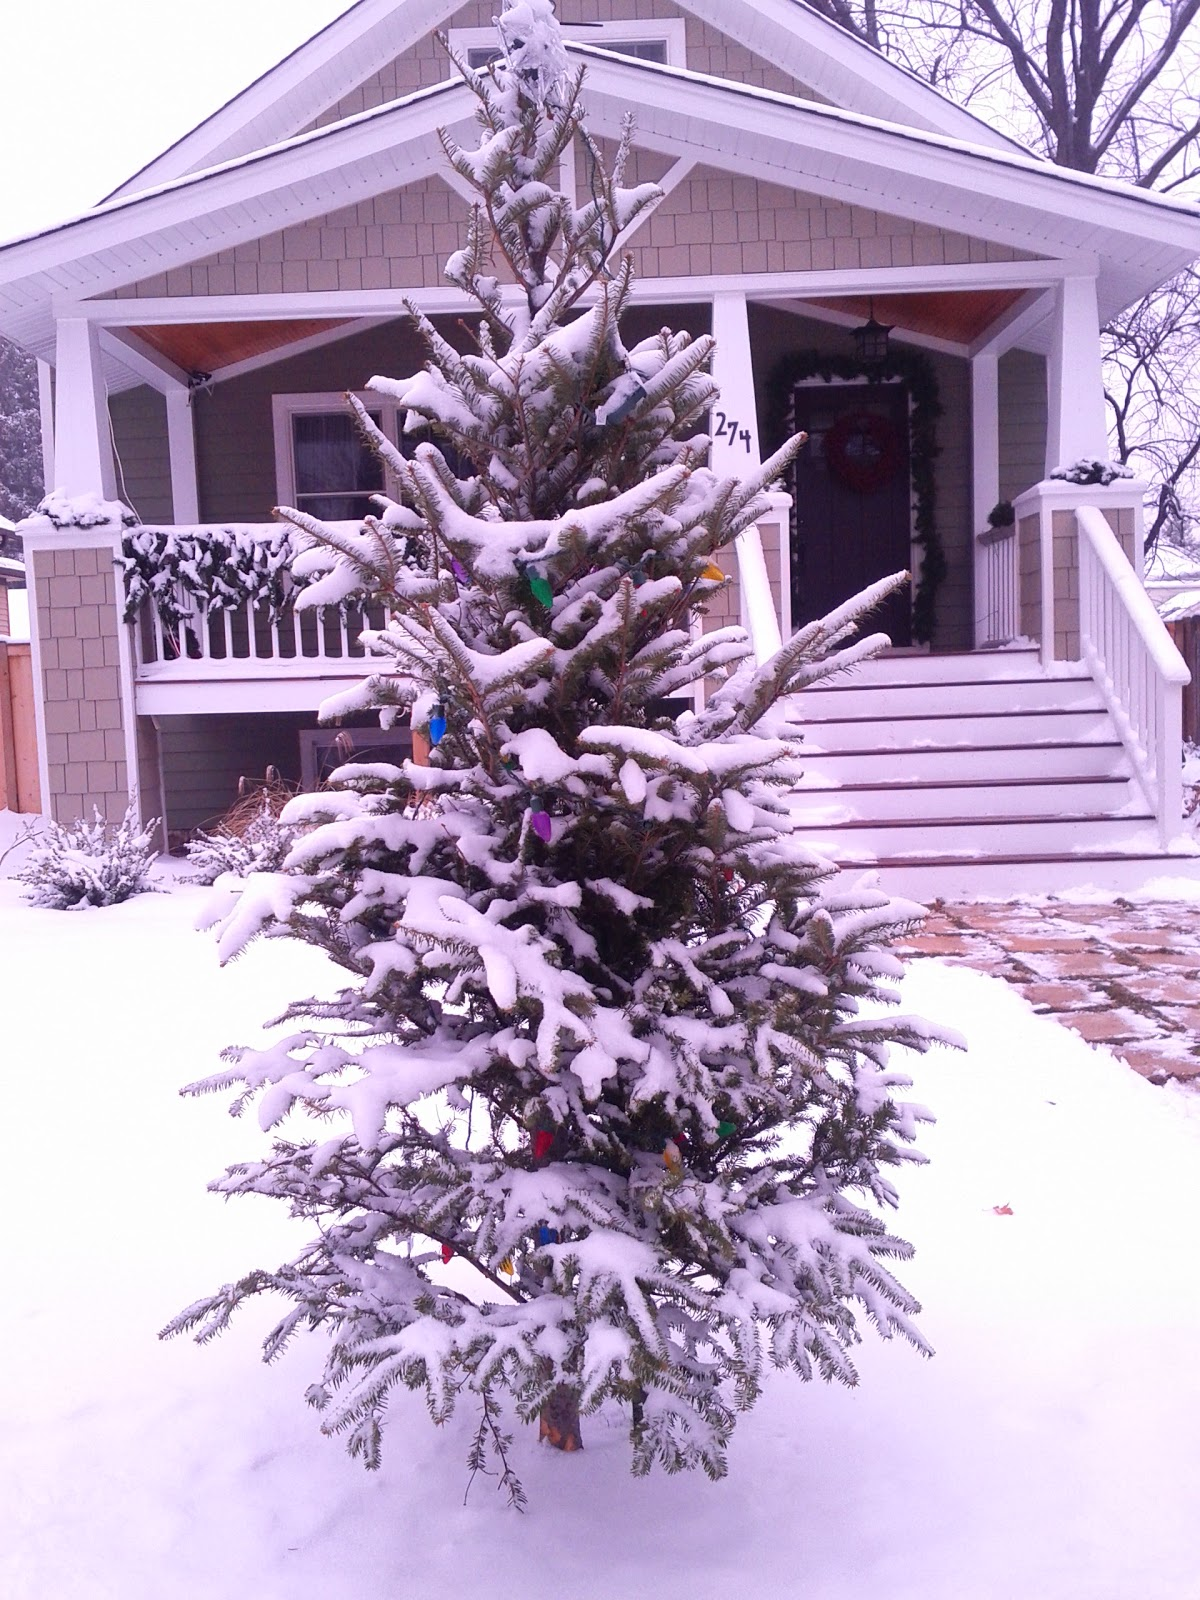 Elmhurst Front Yard Christmas Tree Tradition: 2010 Edition